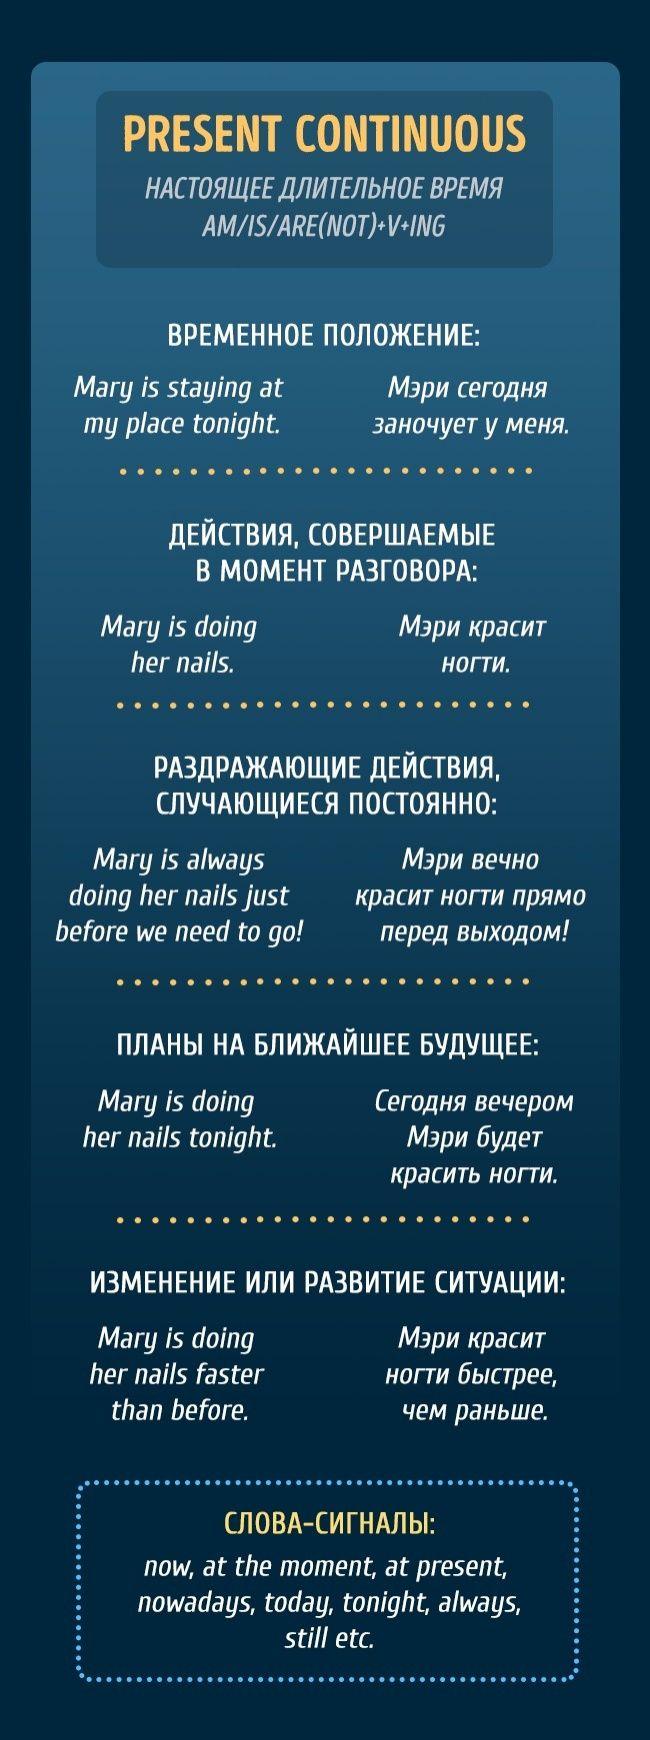 200+ best Grammar images by Olga on Pinterest | English, English ...